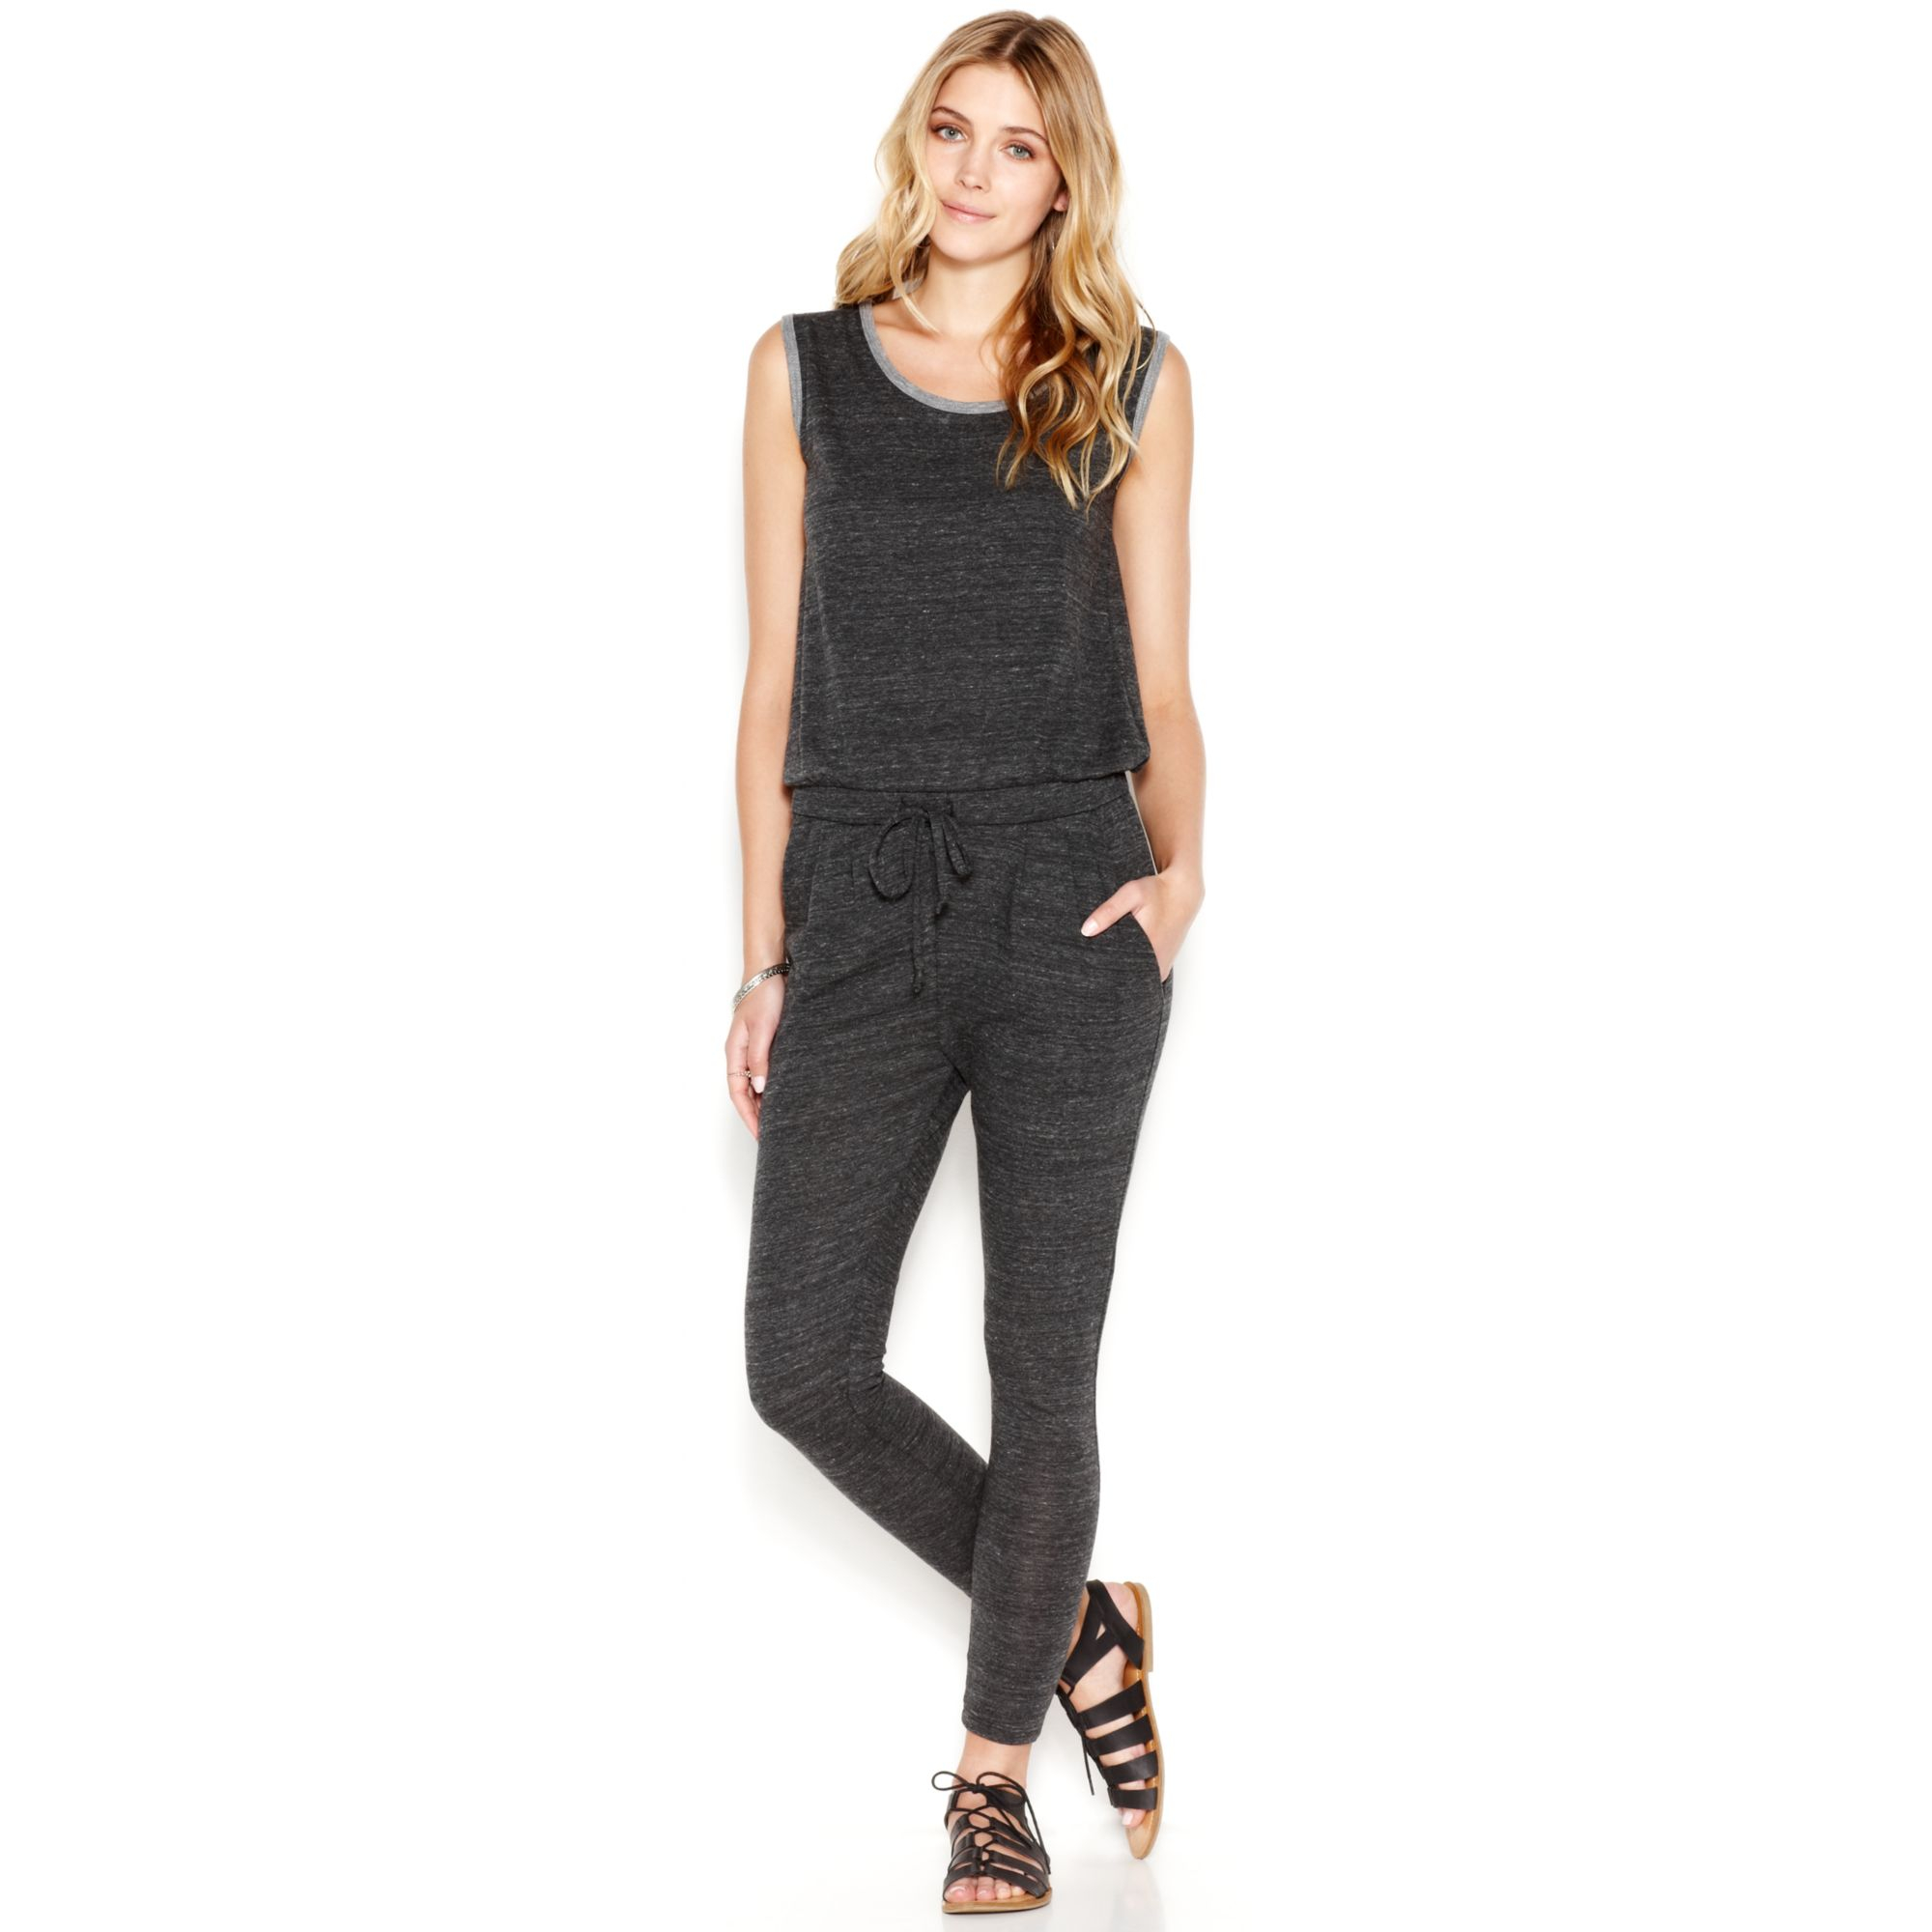 73df716b502 Lyst - Alternative Apparel Santa Cruz Jumpsuit in Black